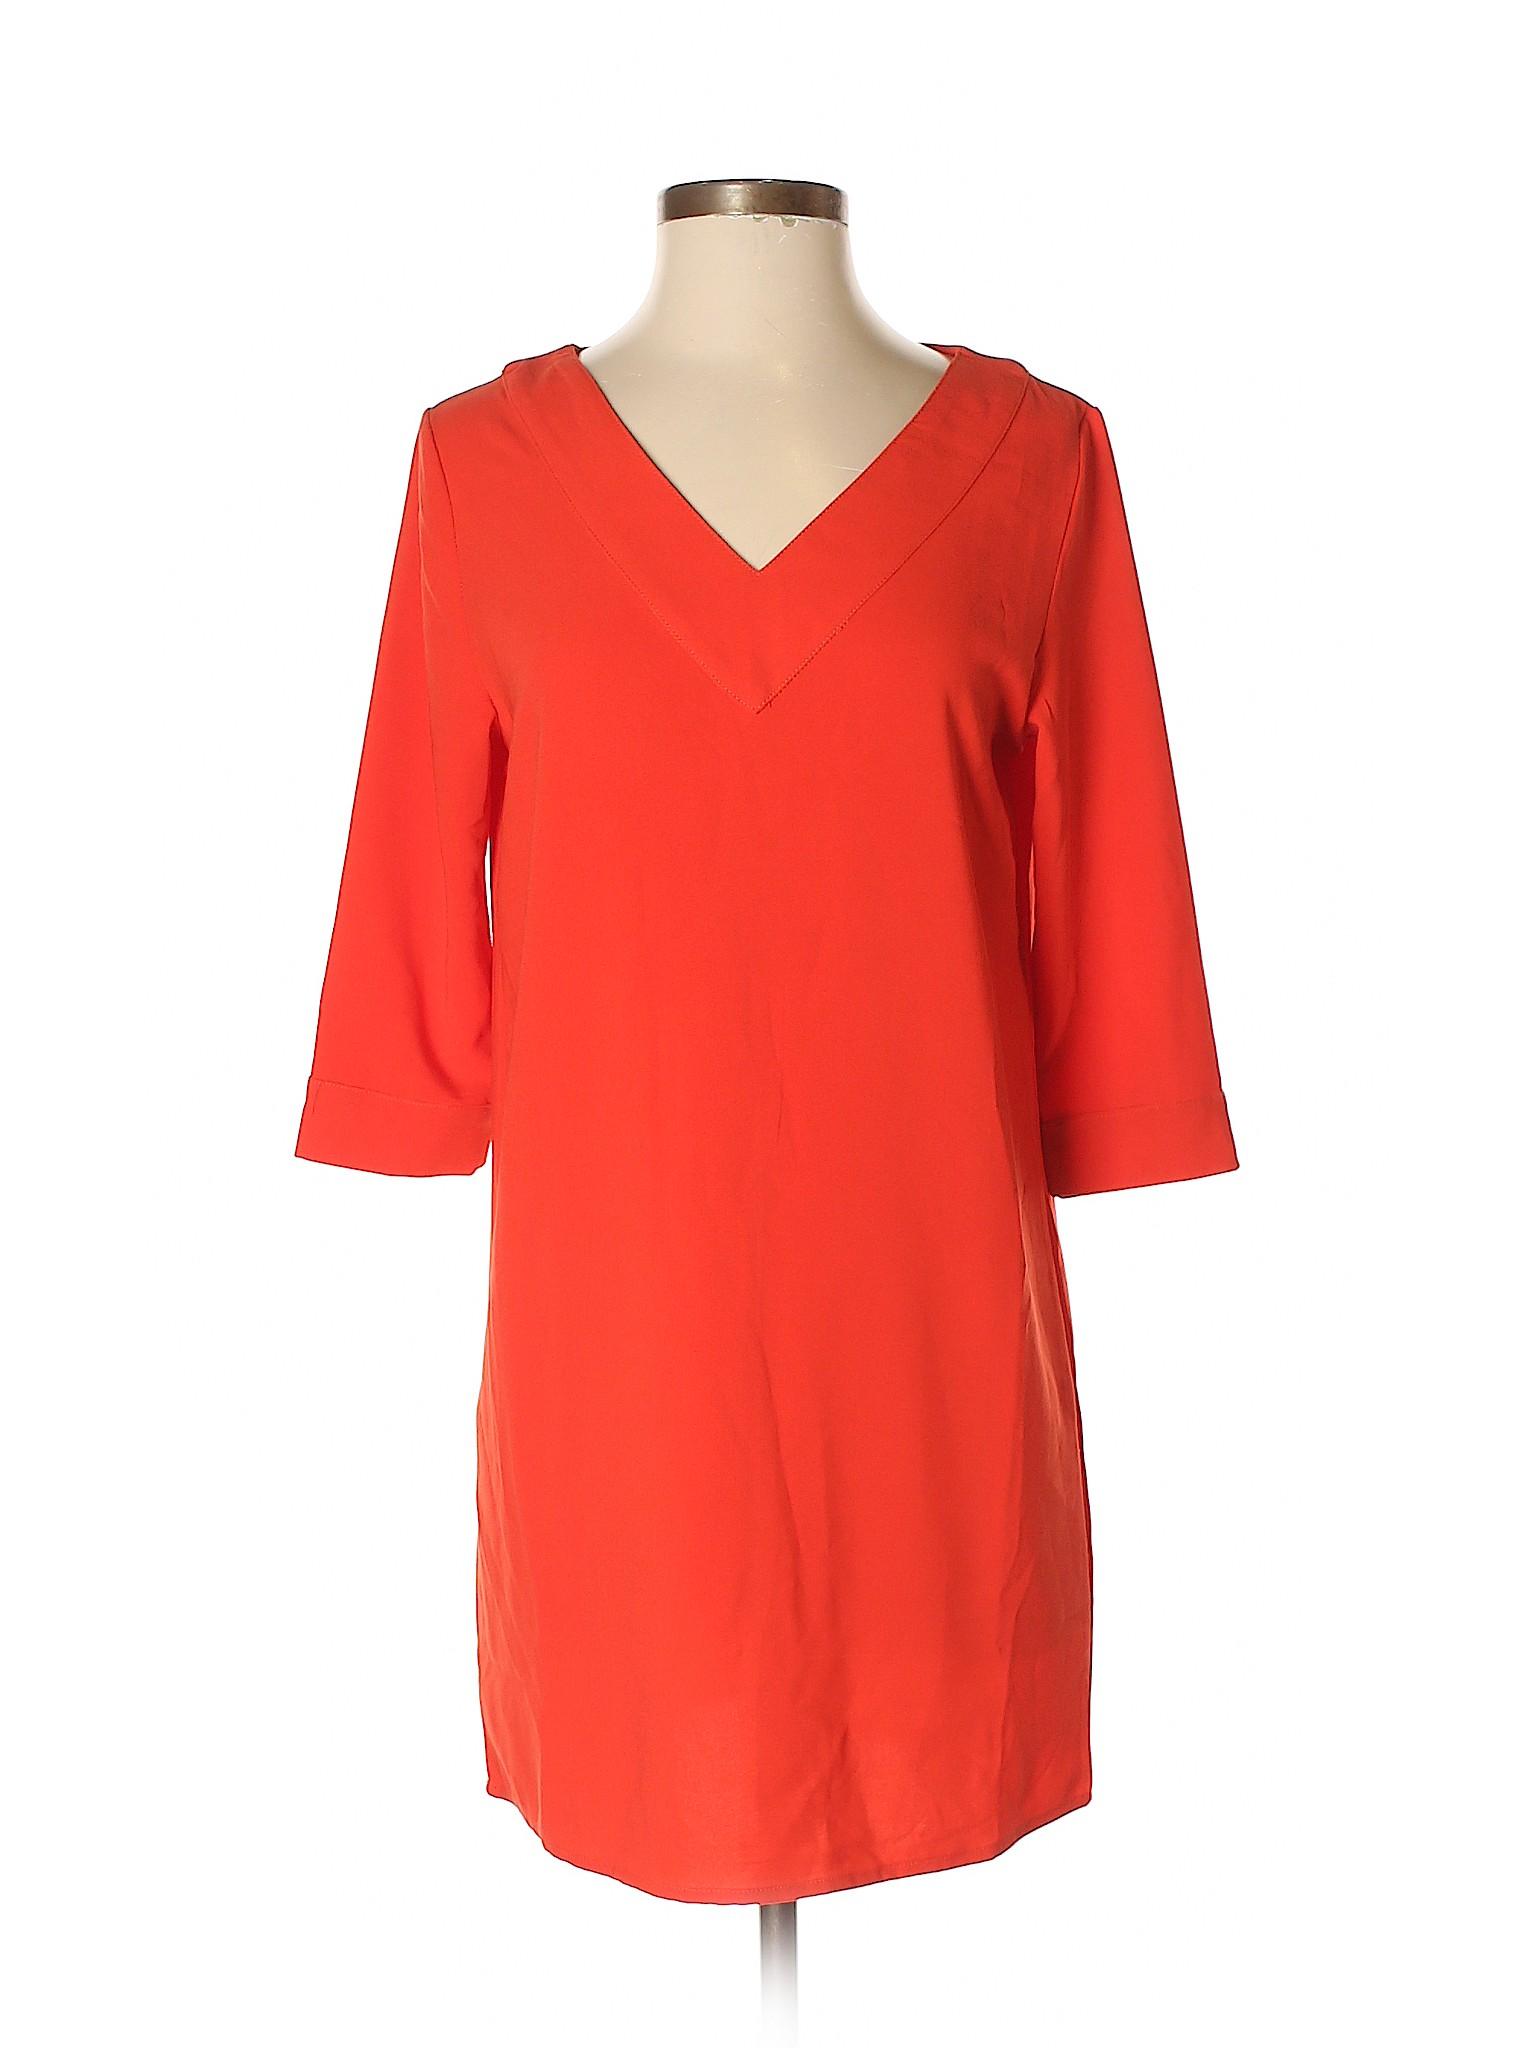 Selling Selling Dress Casual Sheinside Sheinside f0Xdawqq